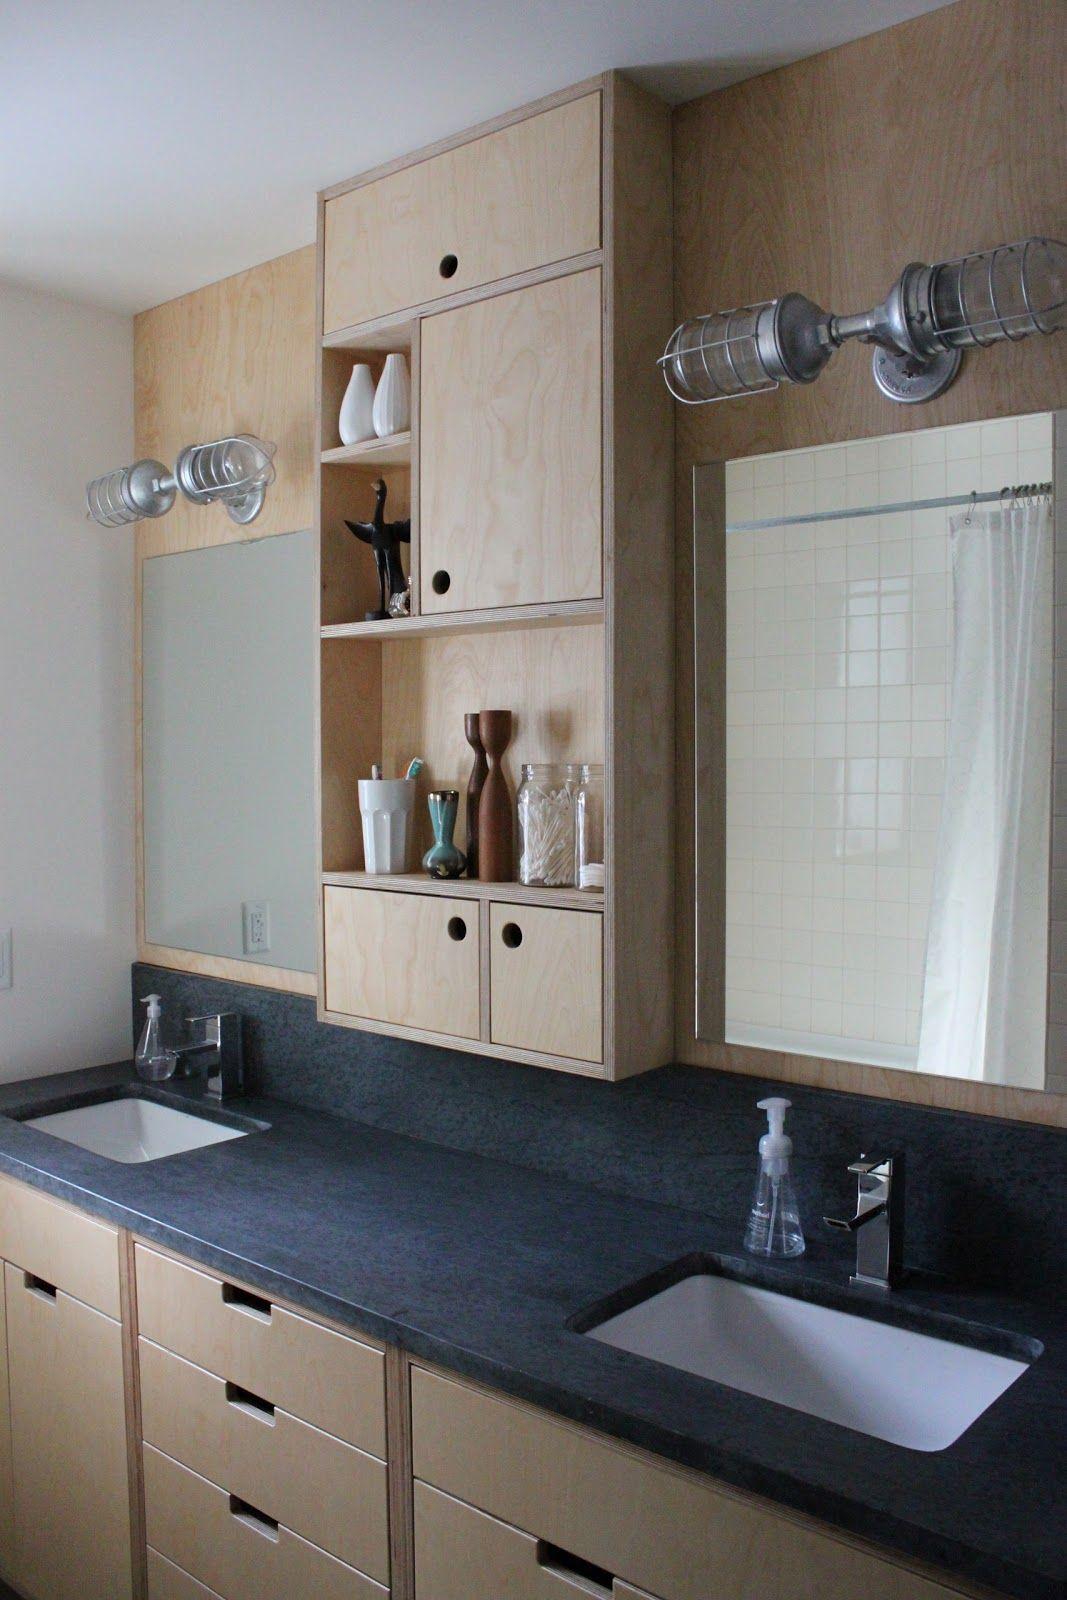 Bathroom Cabinets Bathroom Cabinets Designs Plywood Kitchen Bathroom Storage Cabinet